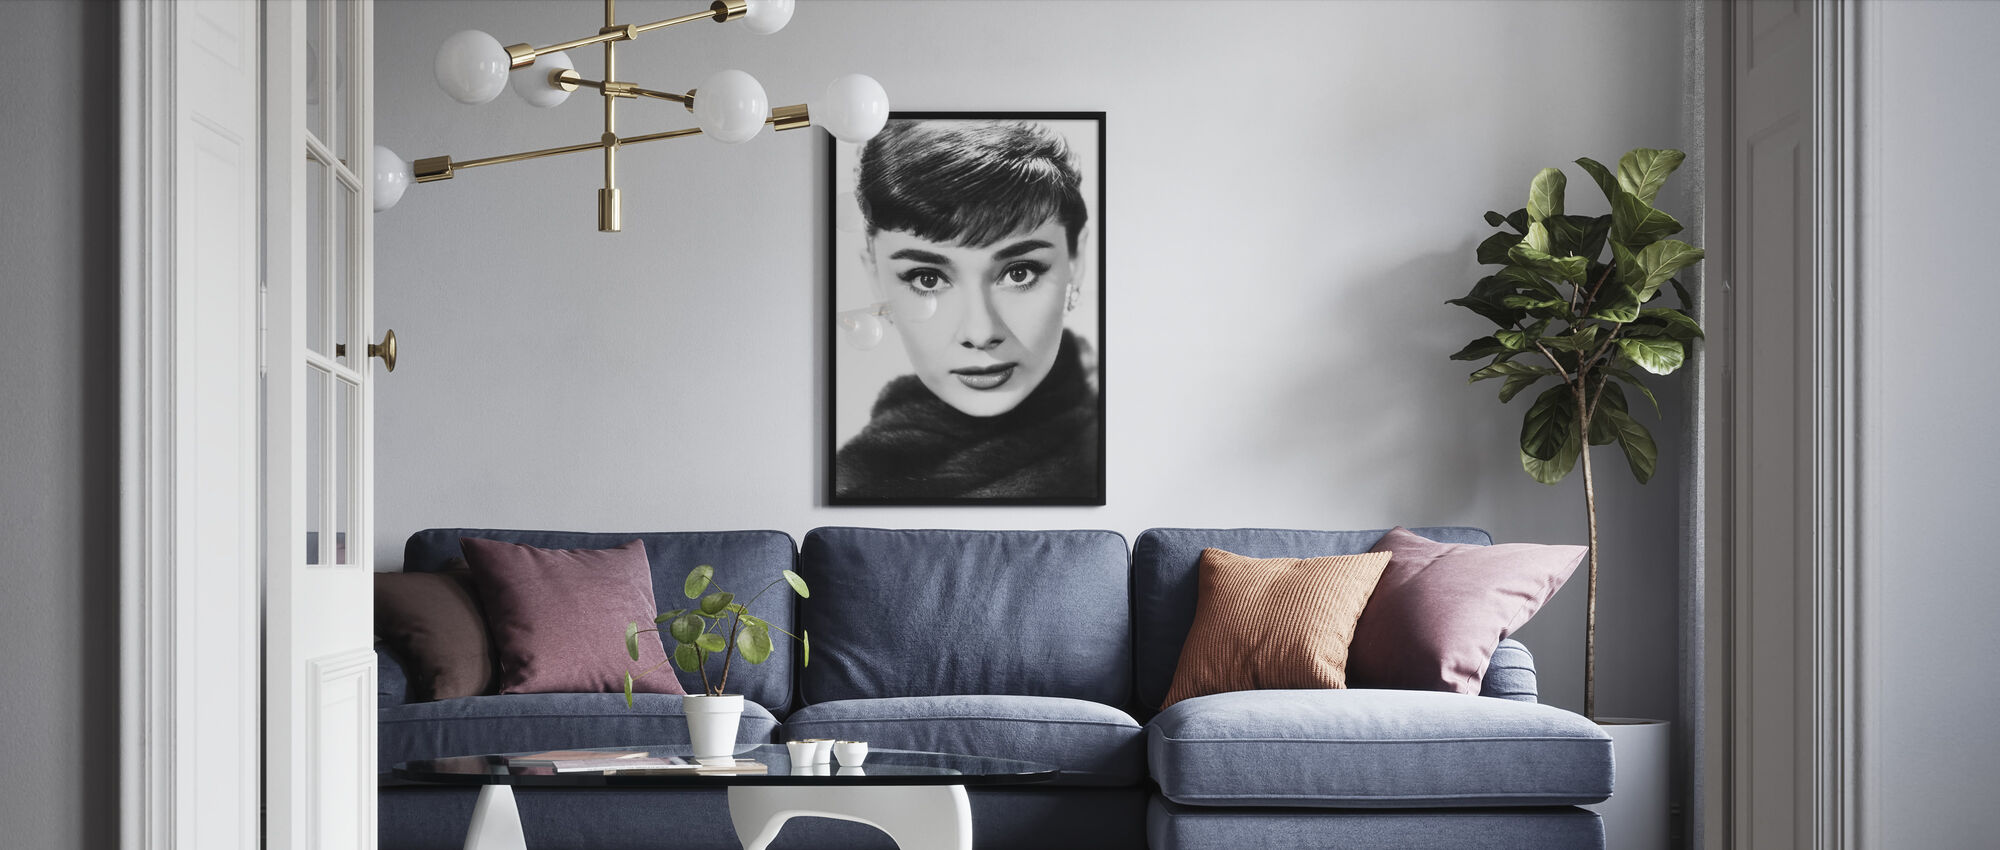 -Sabrina - Innrammet bilde - Stue